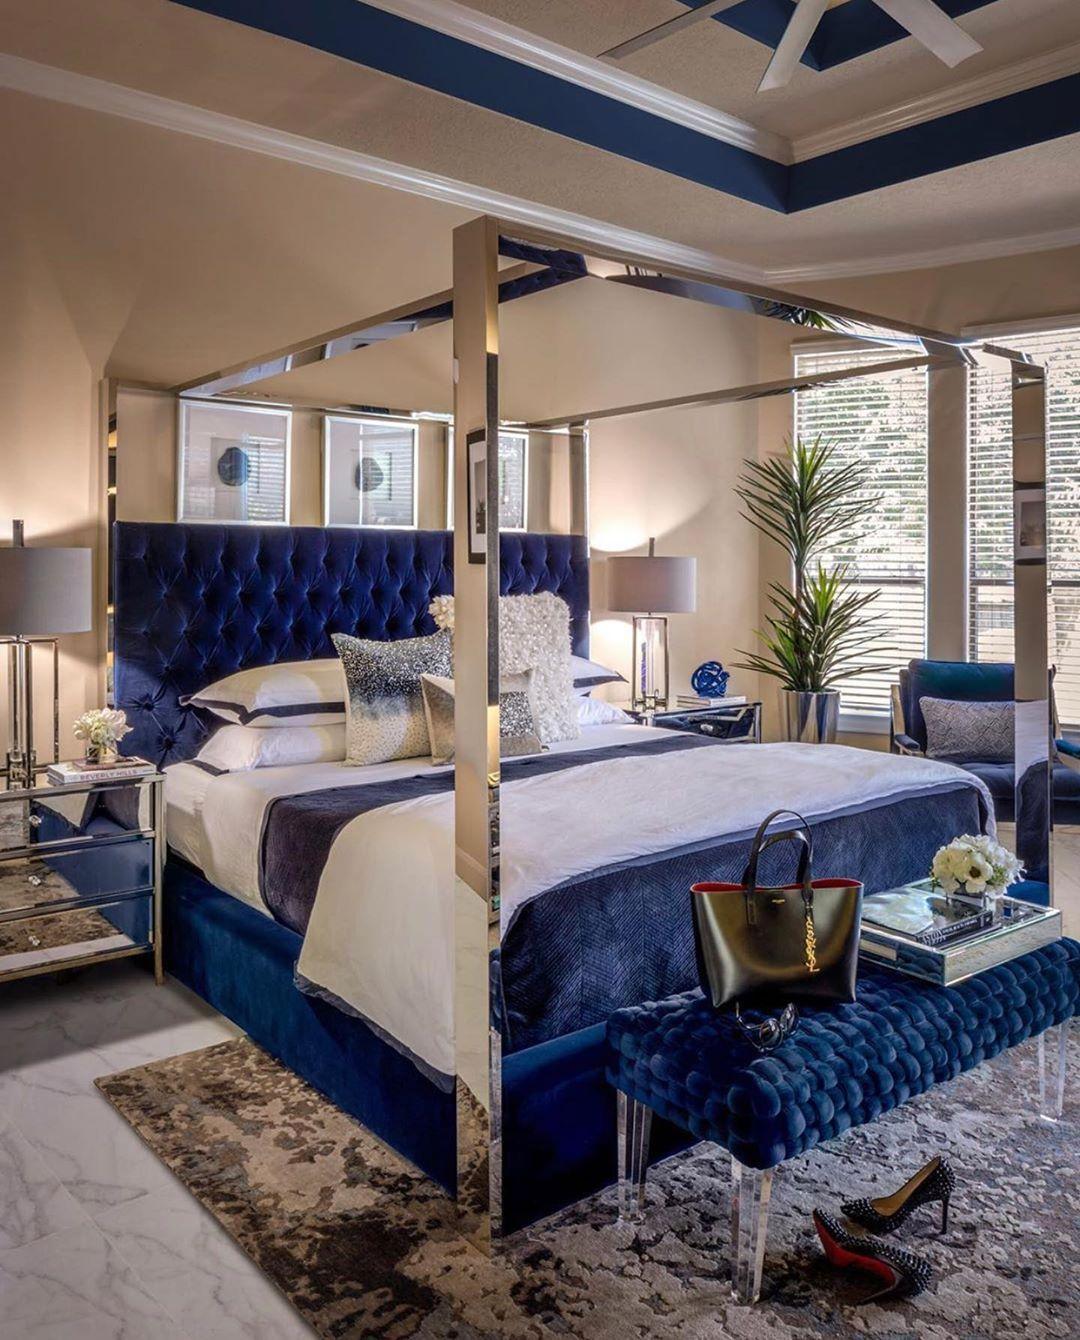 Home Design Ideas Instagram: Vicky On Instagram : Royal Blue Follow @ Home _ Decor